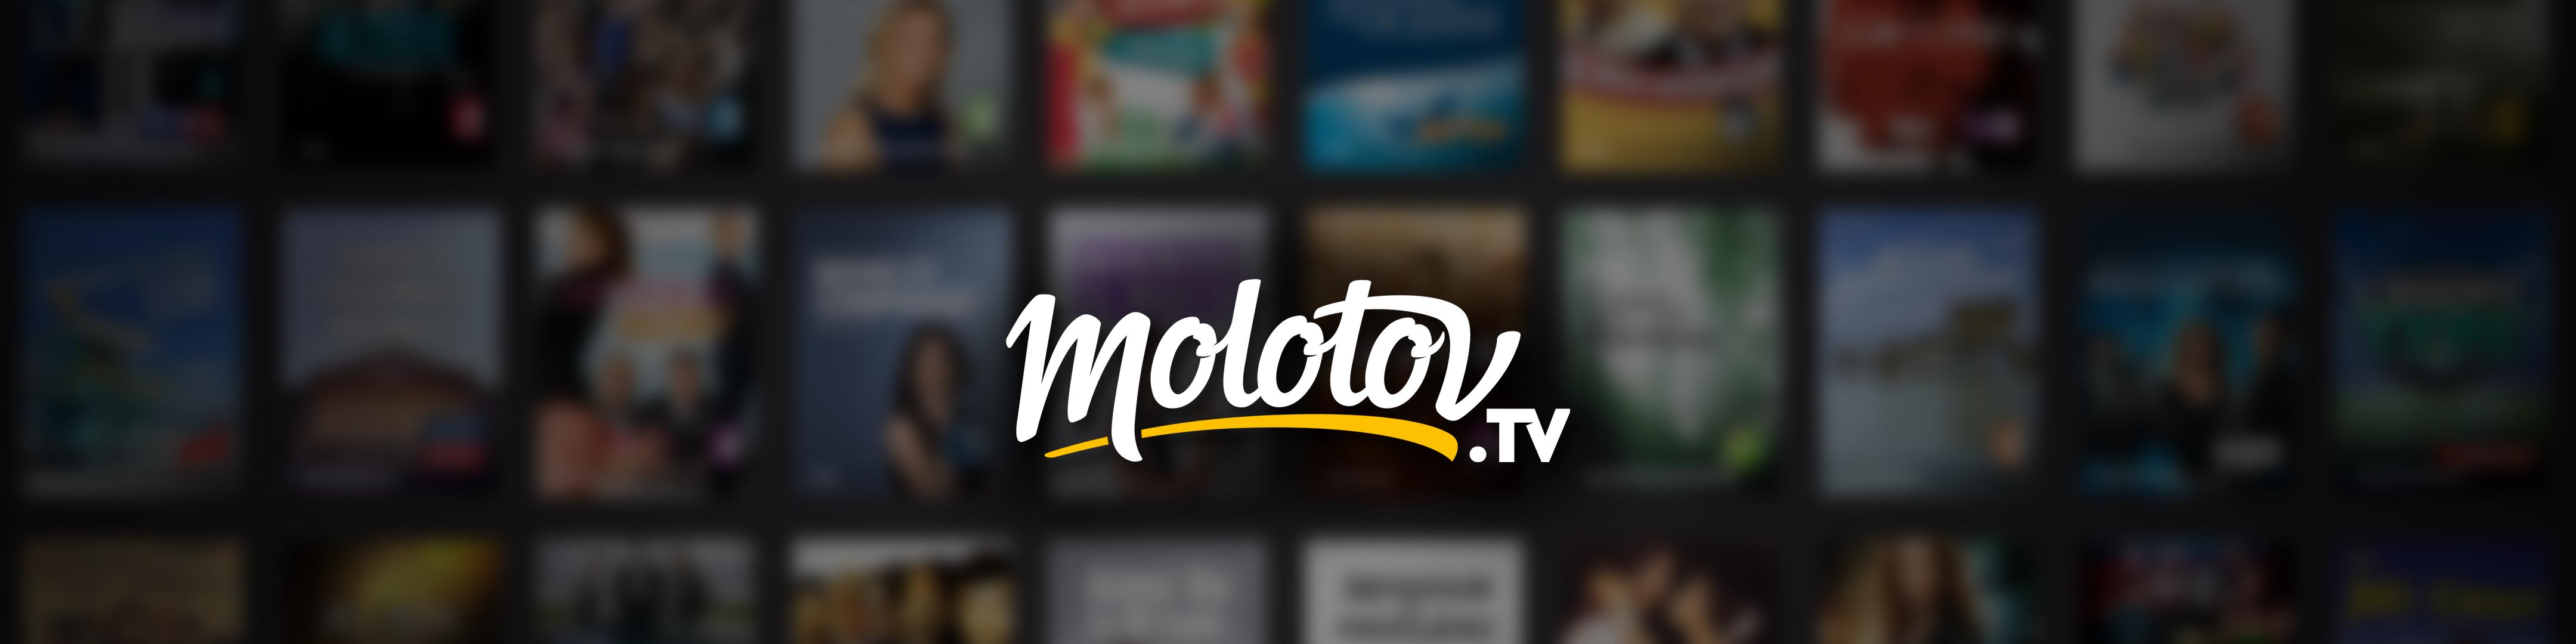 telecharger m6 replay sur tv samsung